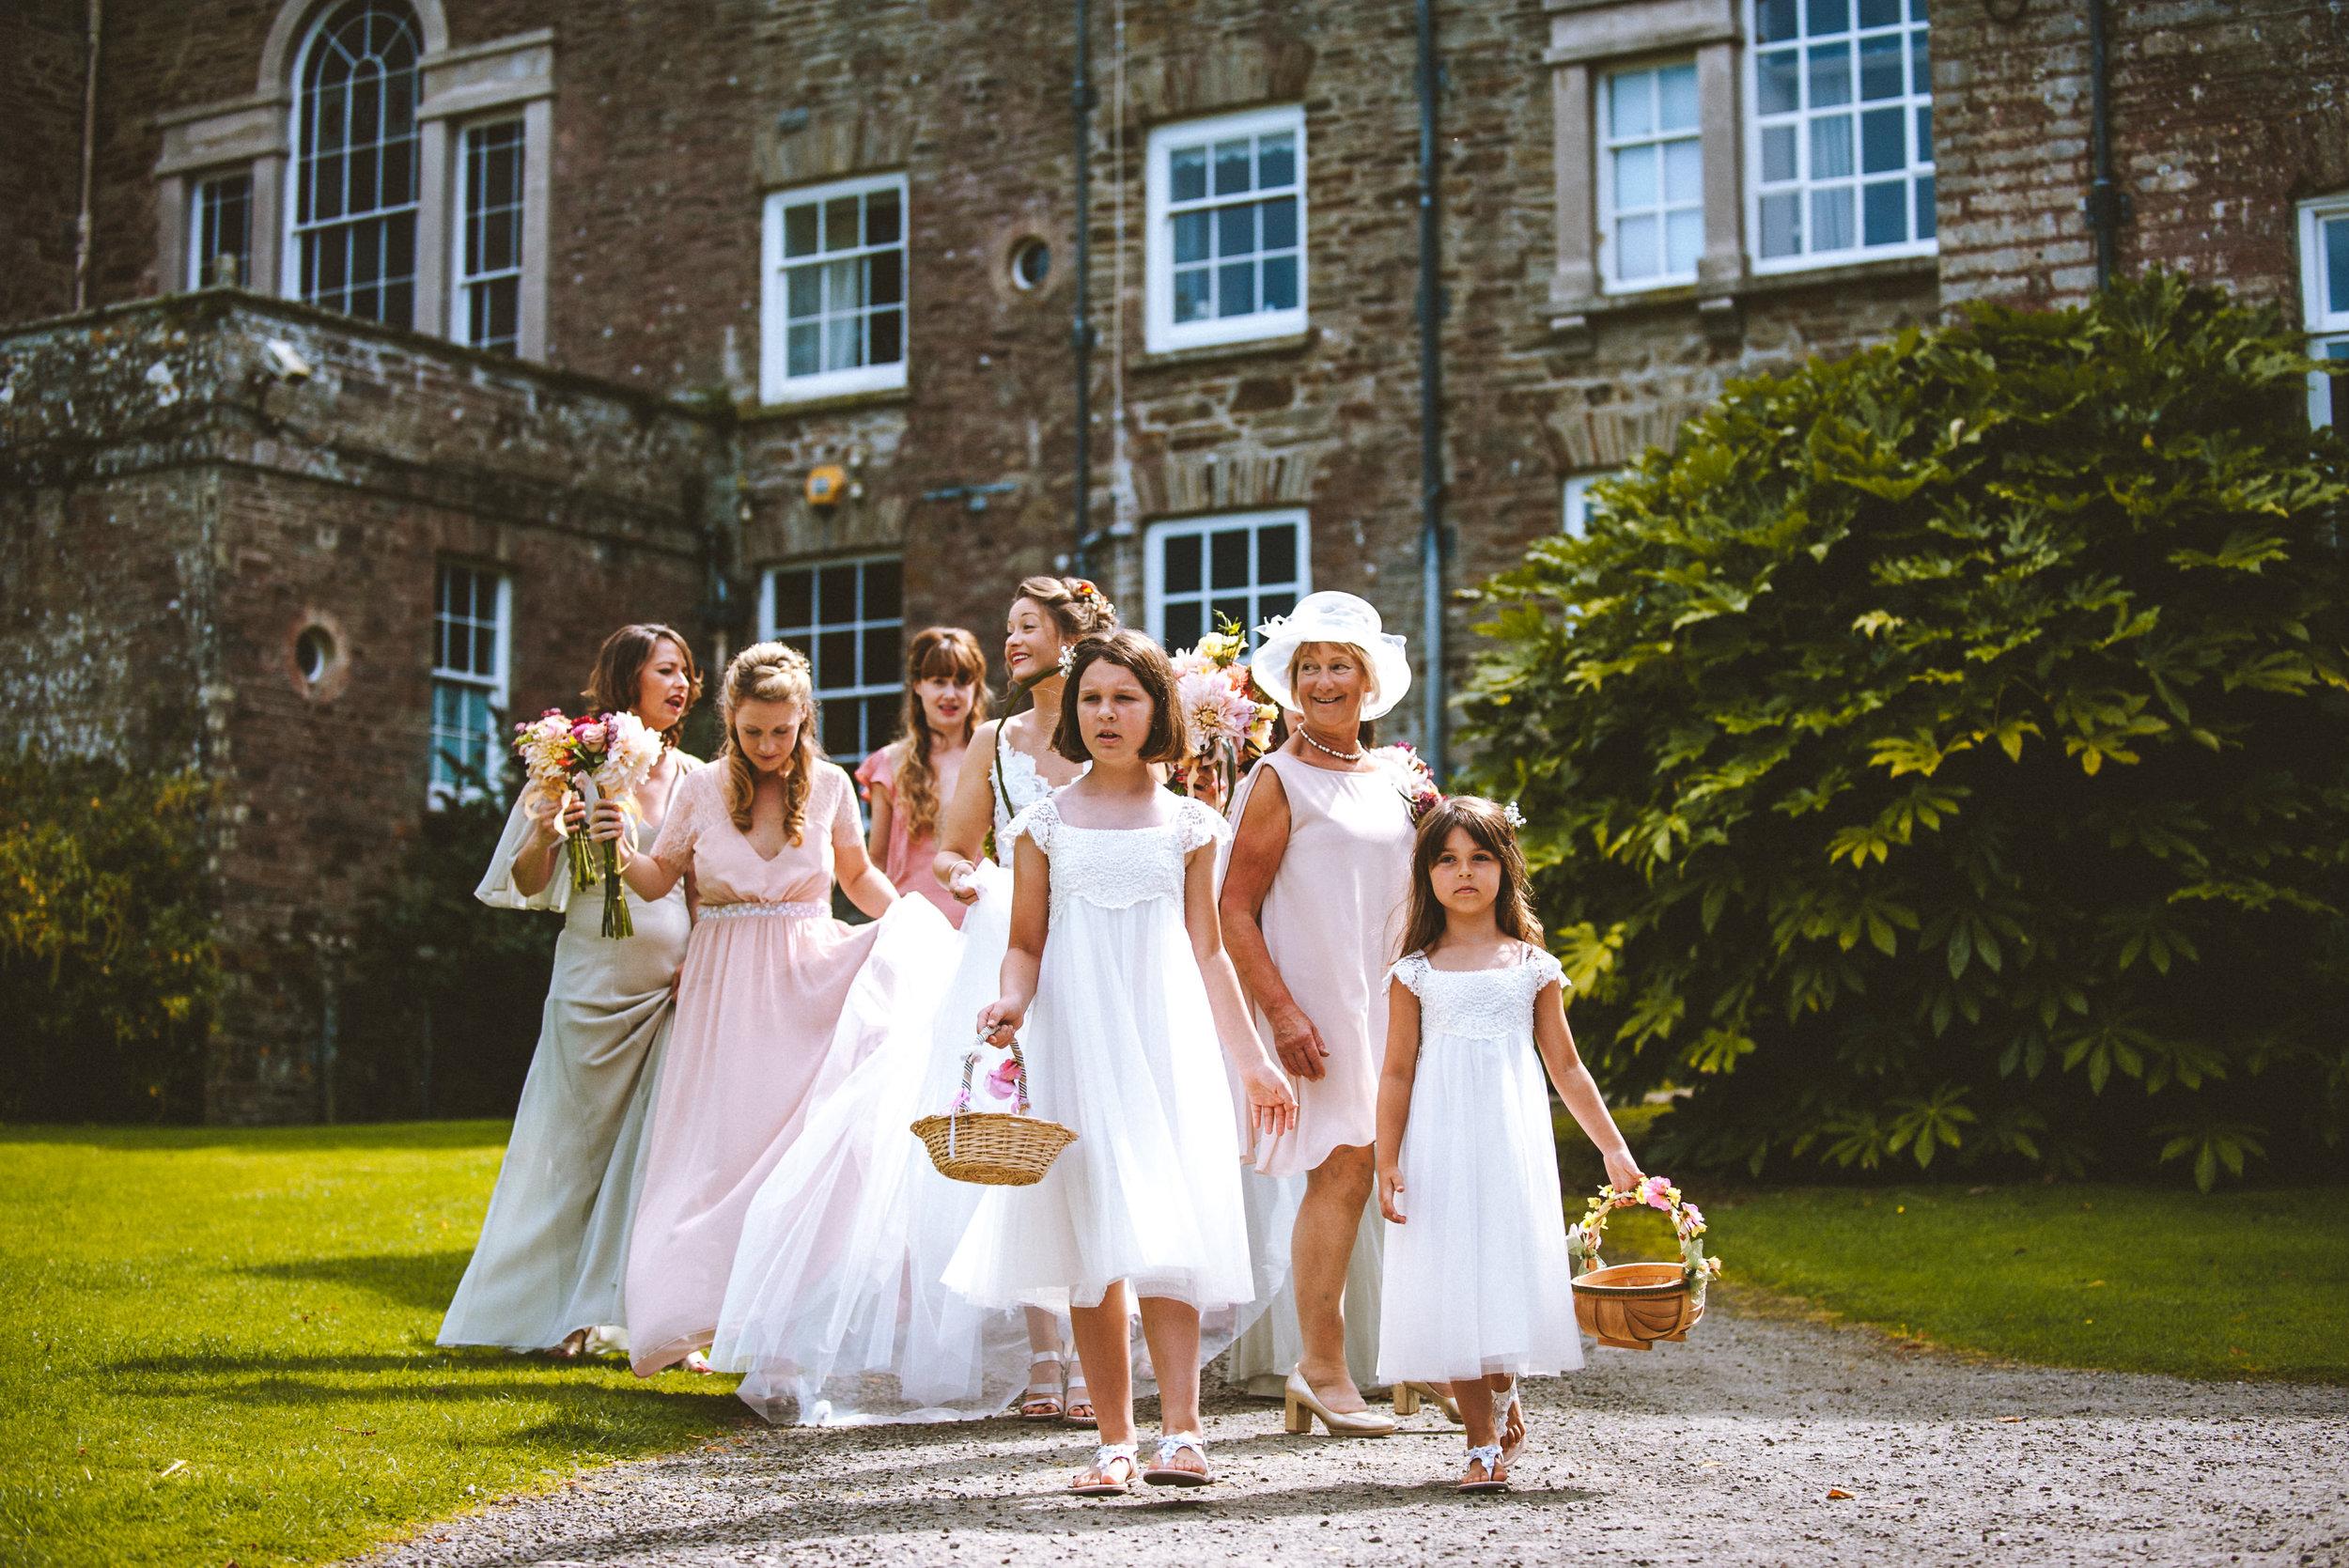 pencarrow-house-wedding-photographer-33.jpg